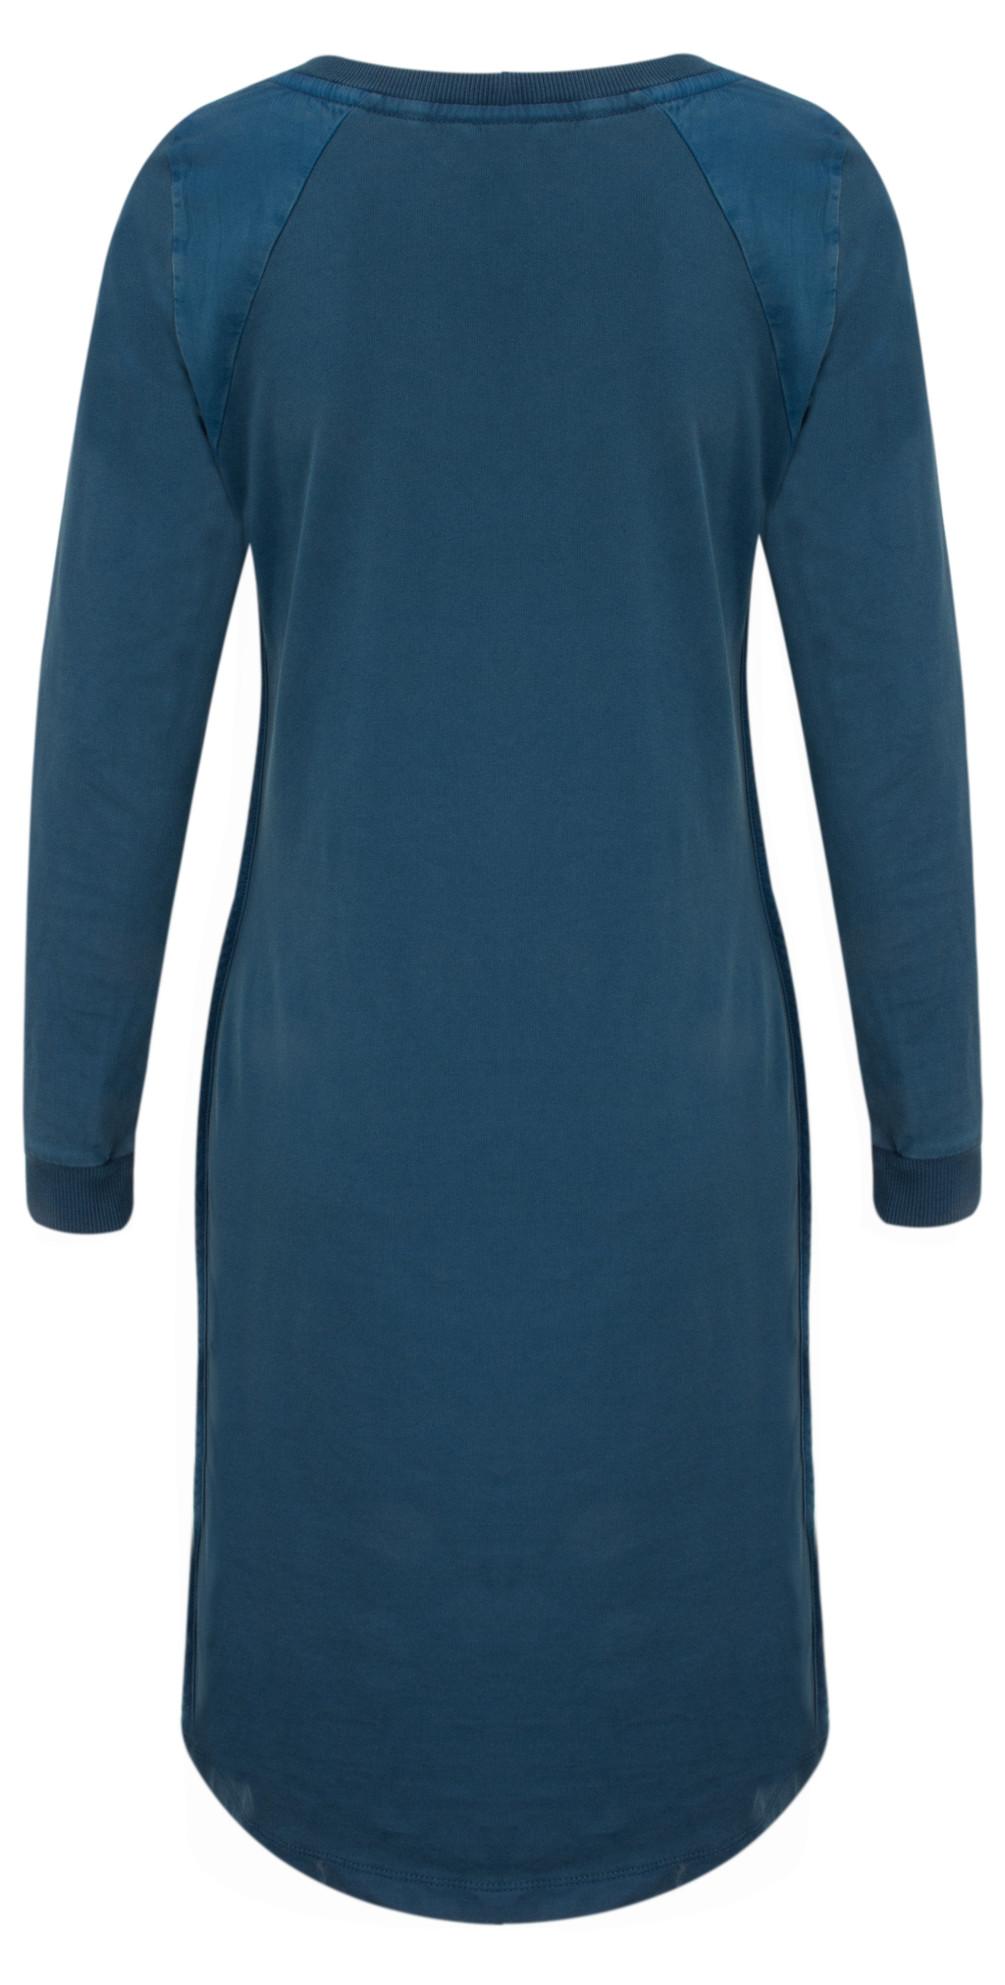 sandwich clothing single jersey dress in patriot blue. Black Bedroom Furniture Sets. Home Design Ideas